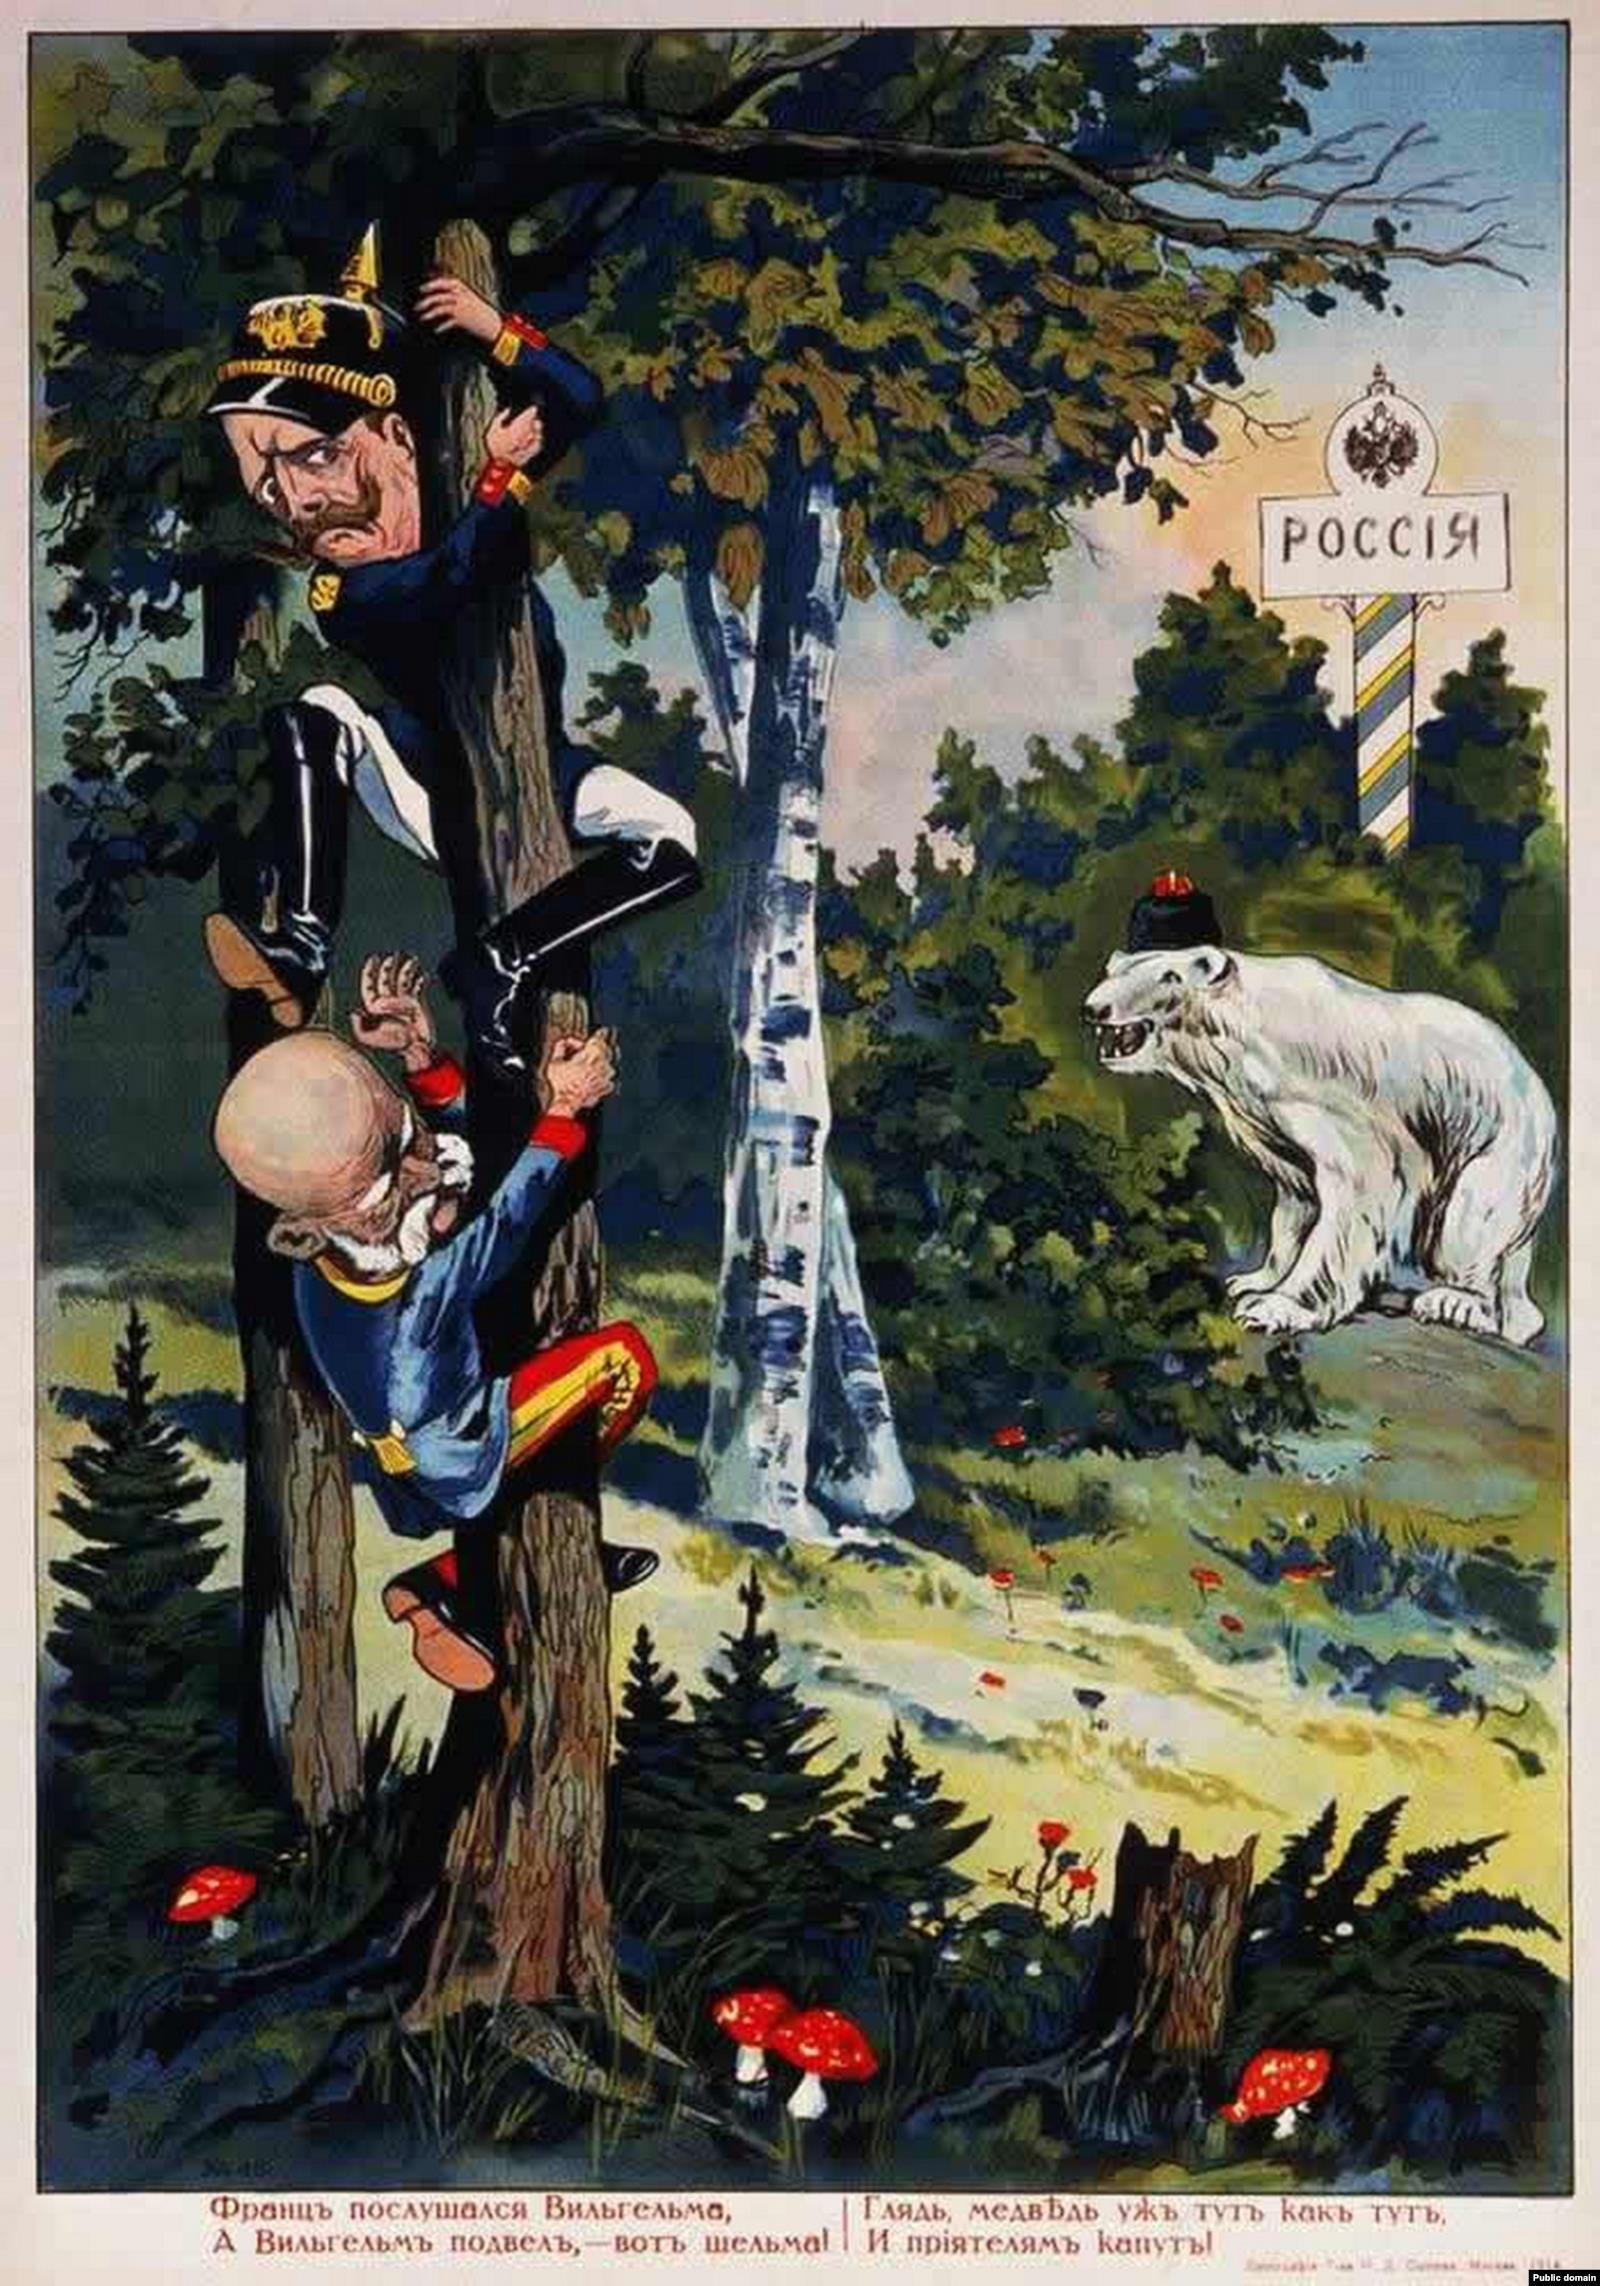 The Art Of War: Russian Propaganda In WWI